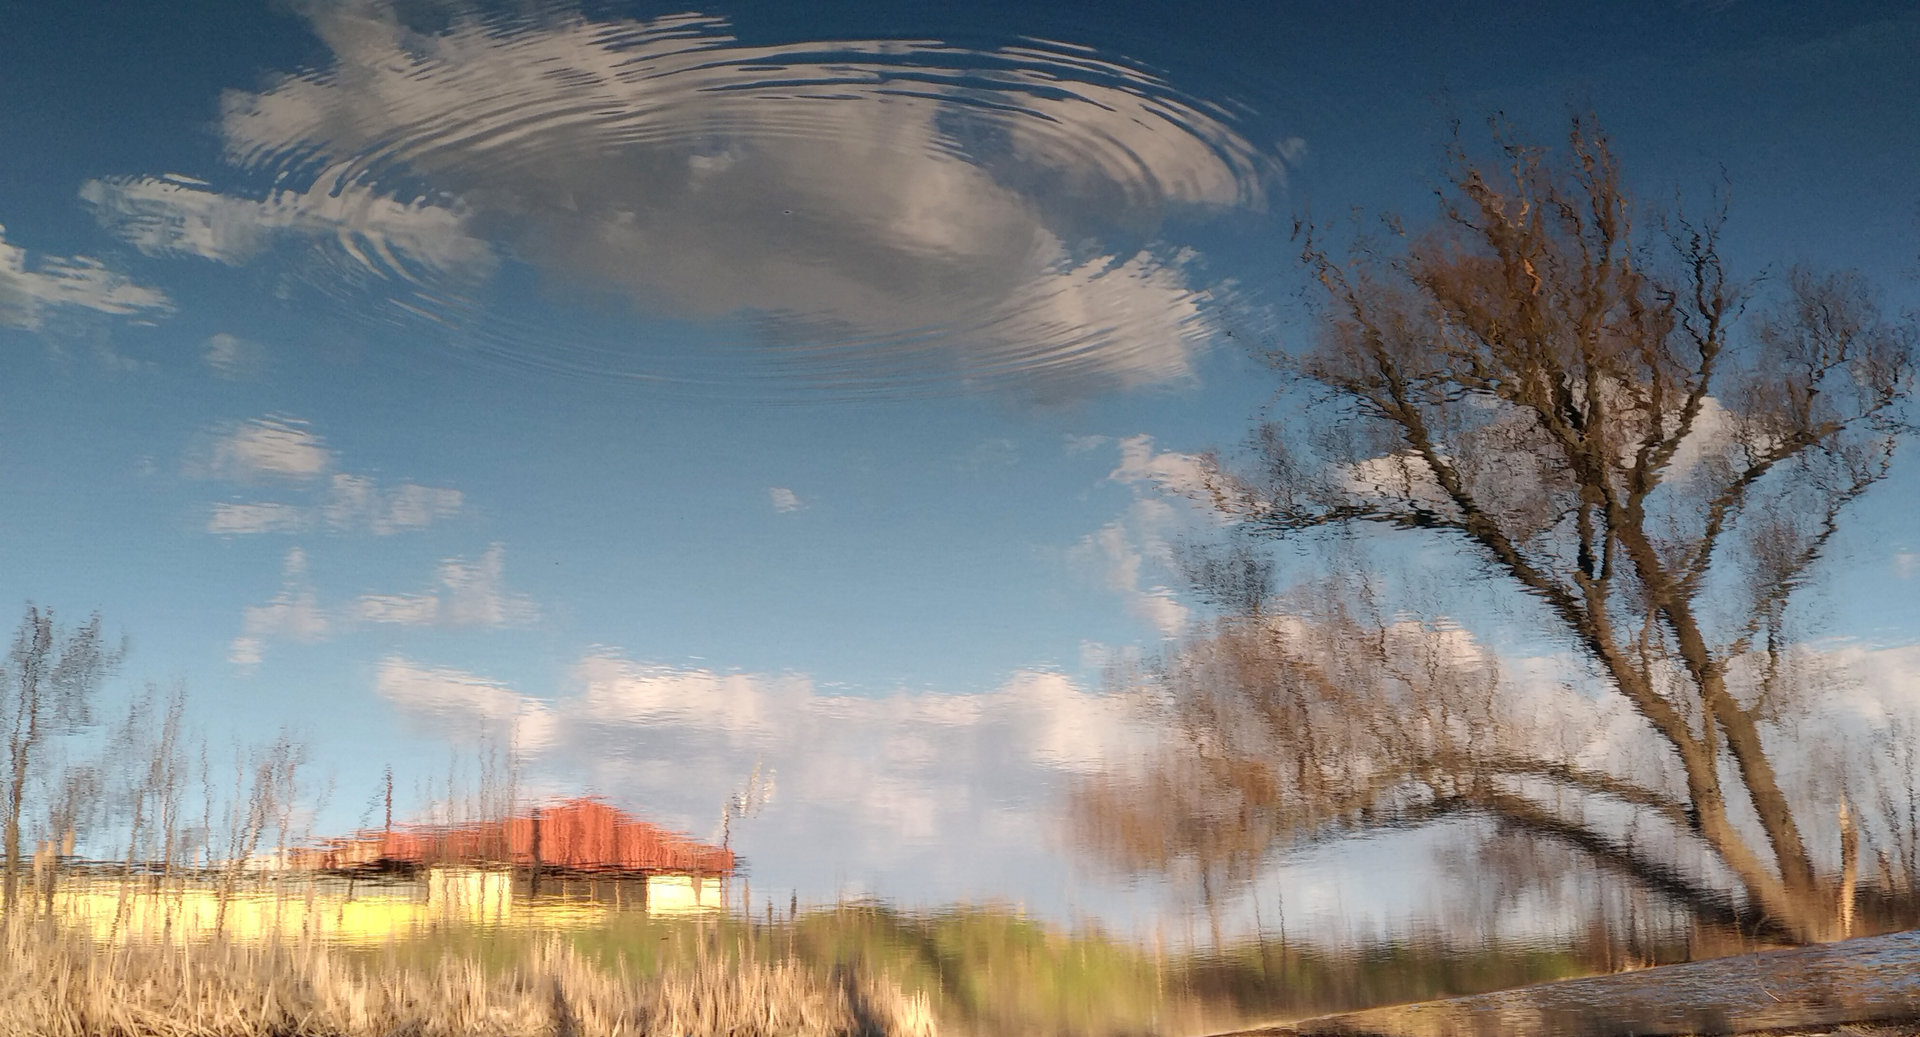 Photo in Abstract | Author Марин Маринов - gari | PHOTO FORUM